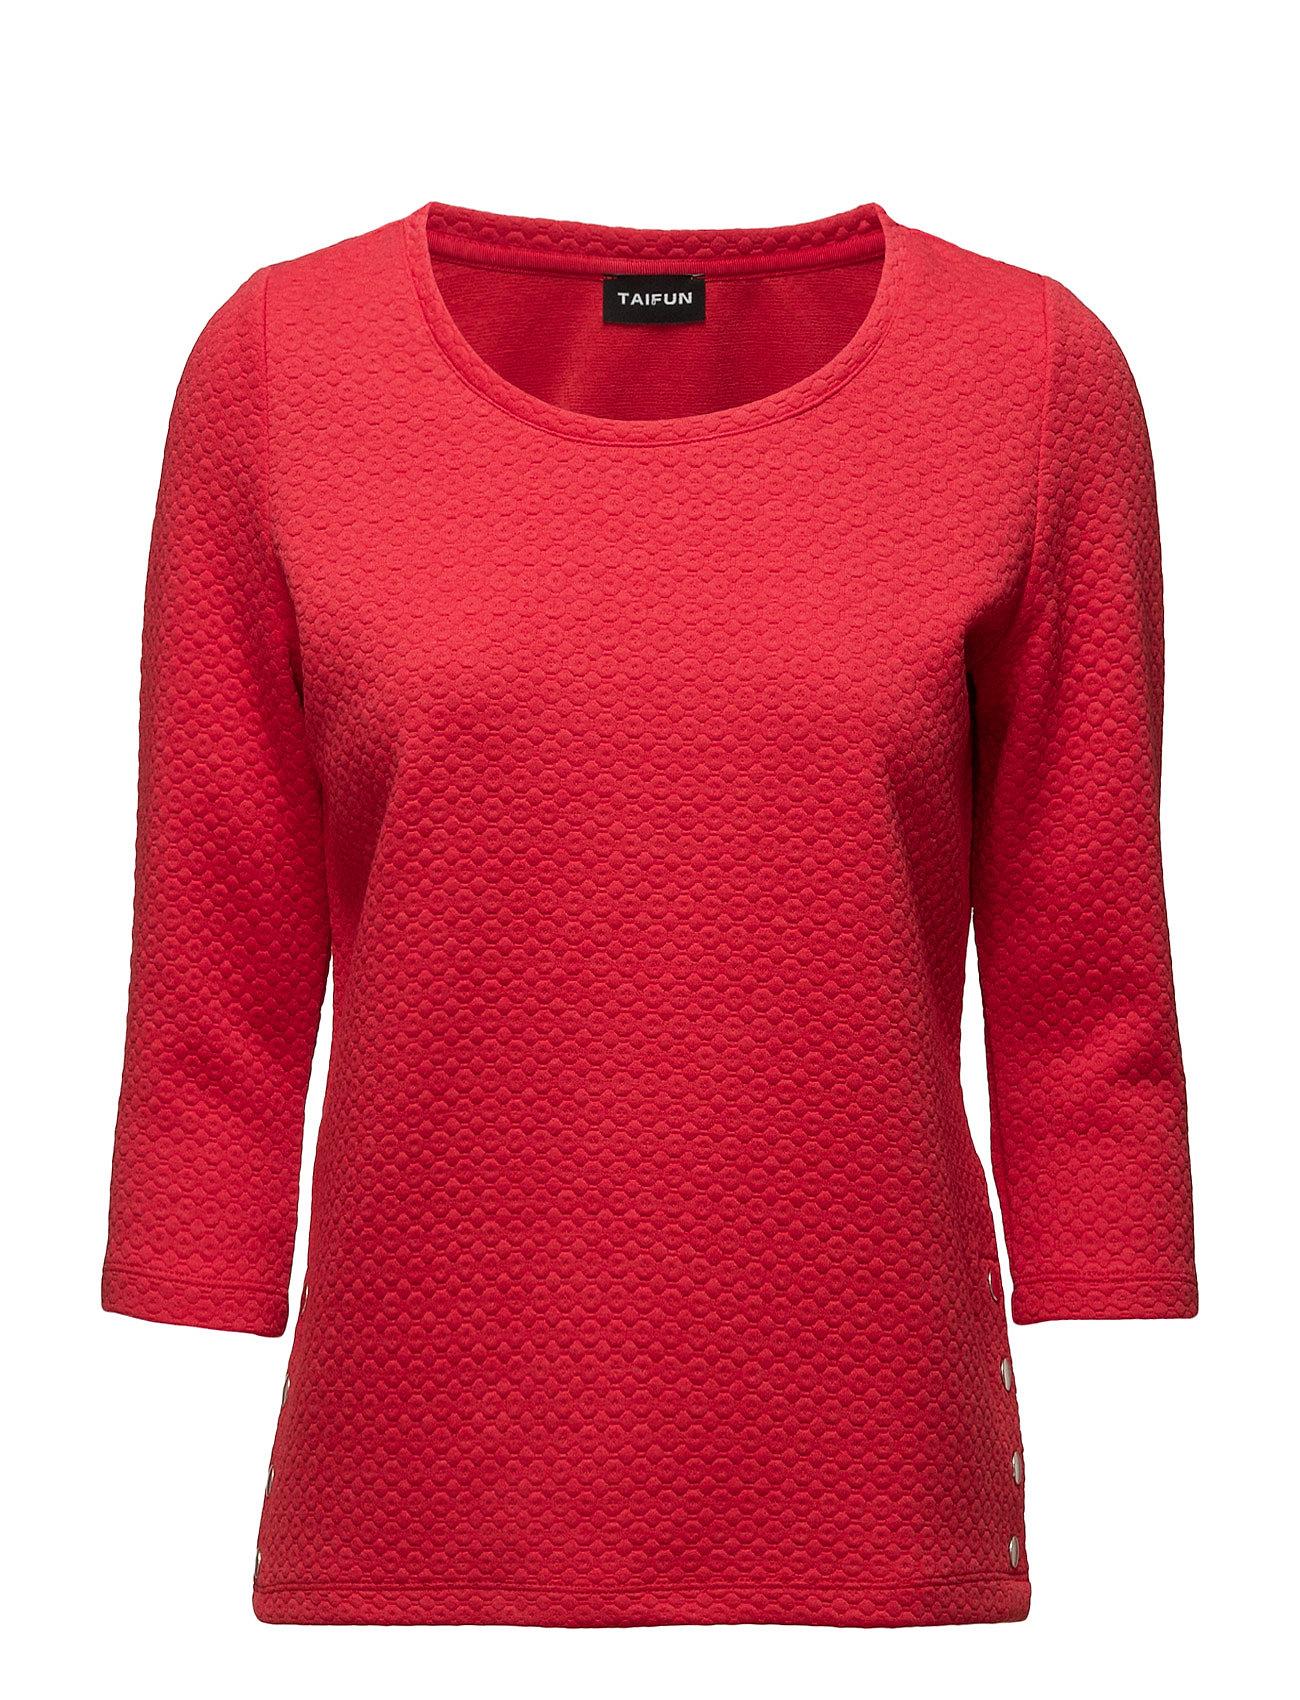 T-Shirt 3/4-Sleeve R Taifun Striktrøjer til Kvinder i